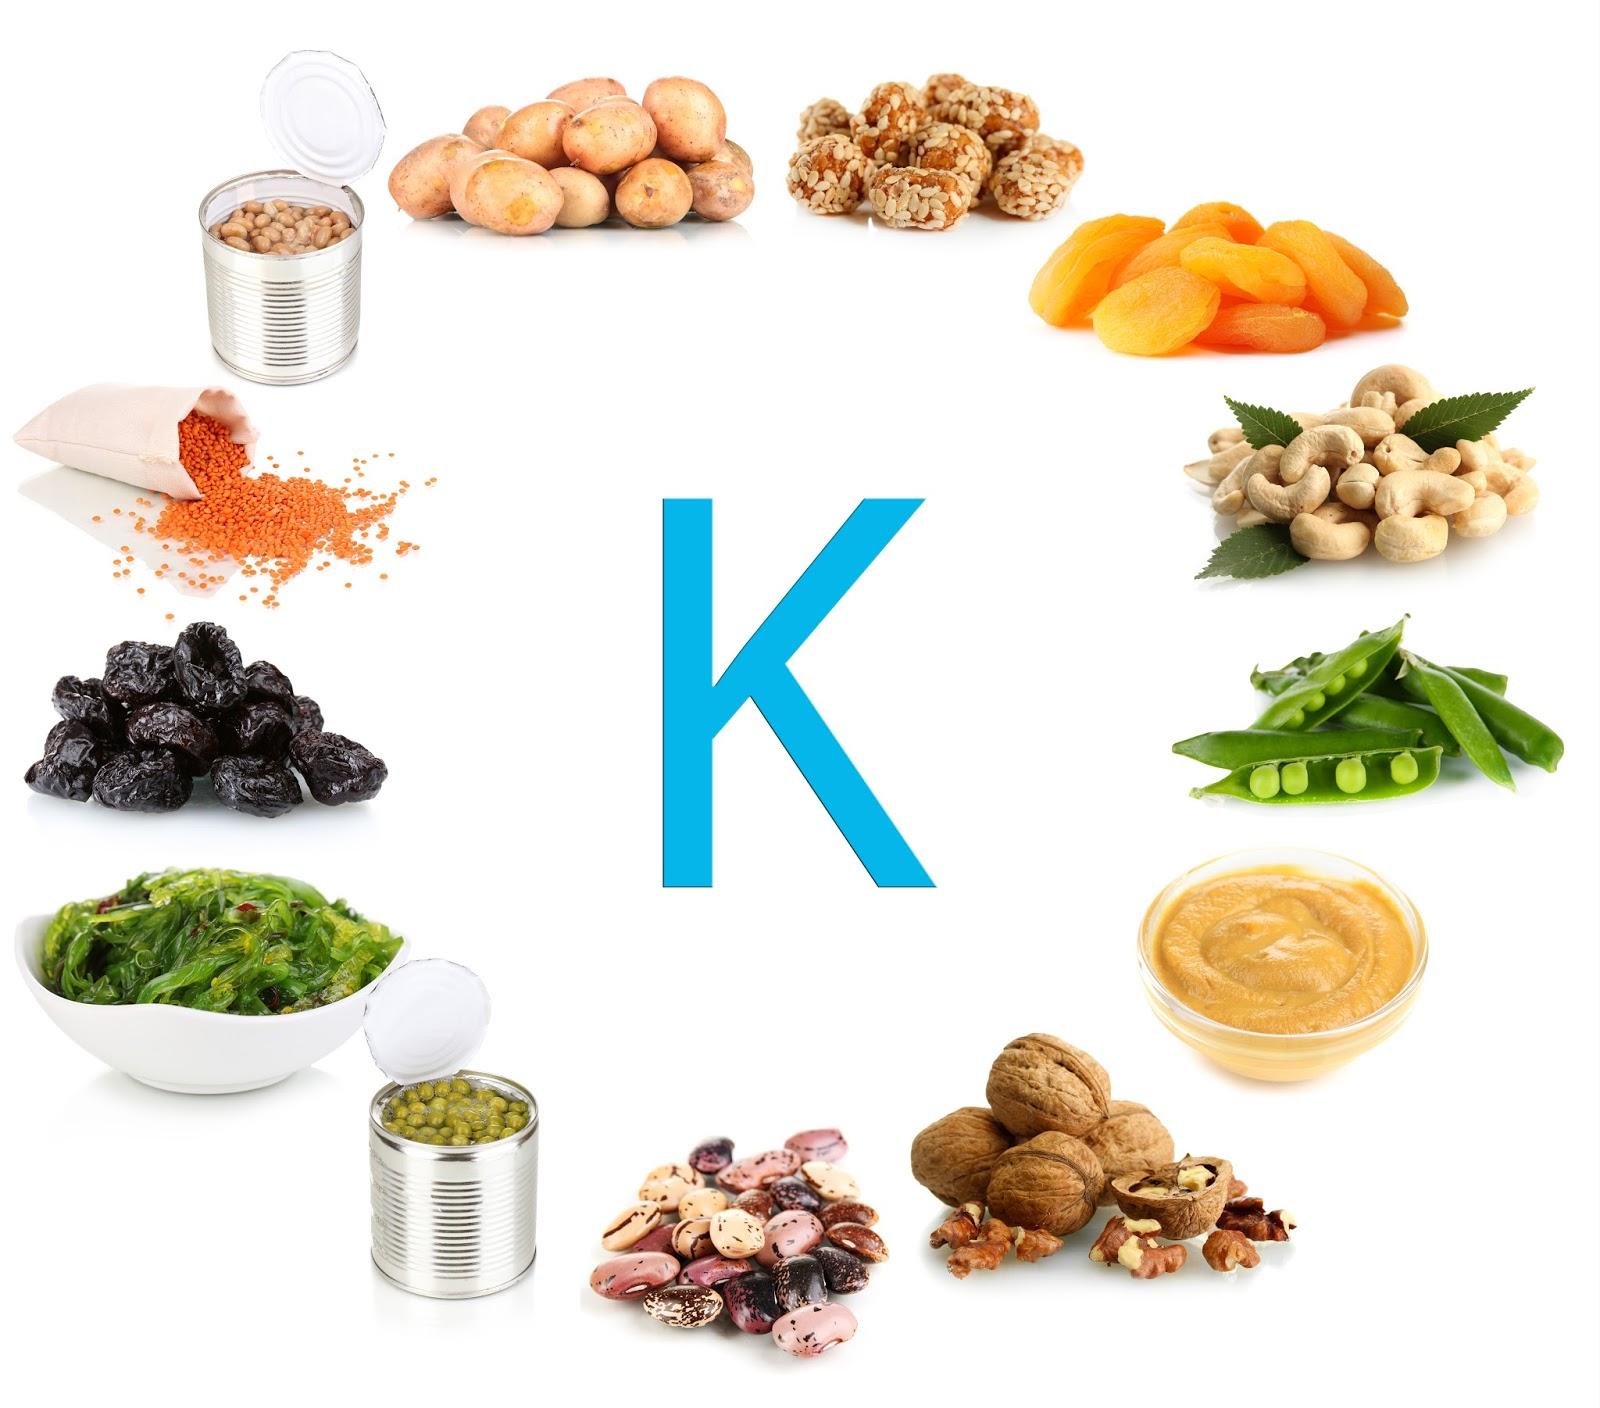 foods-containing-potassium